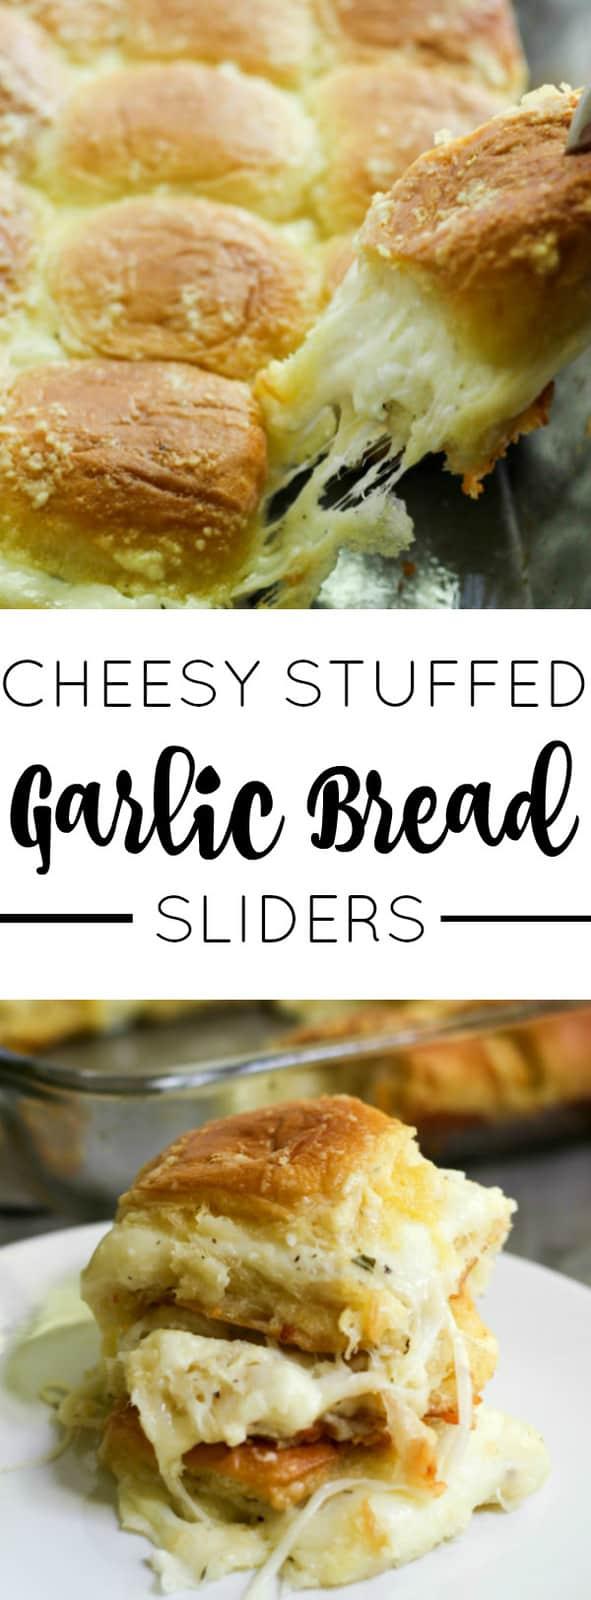 Cheesy Stuffed Garlic Bread Sliders